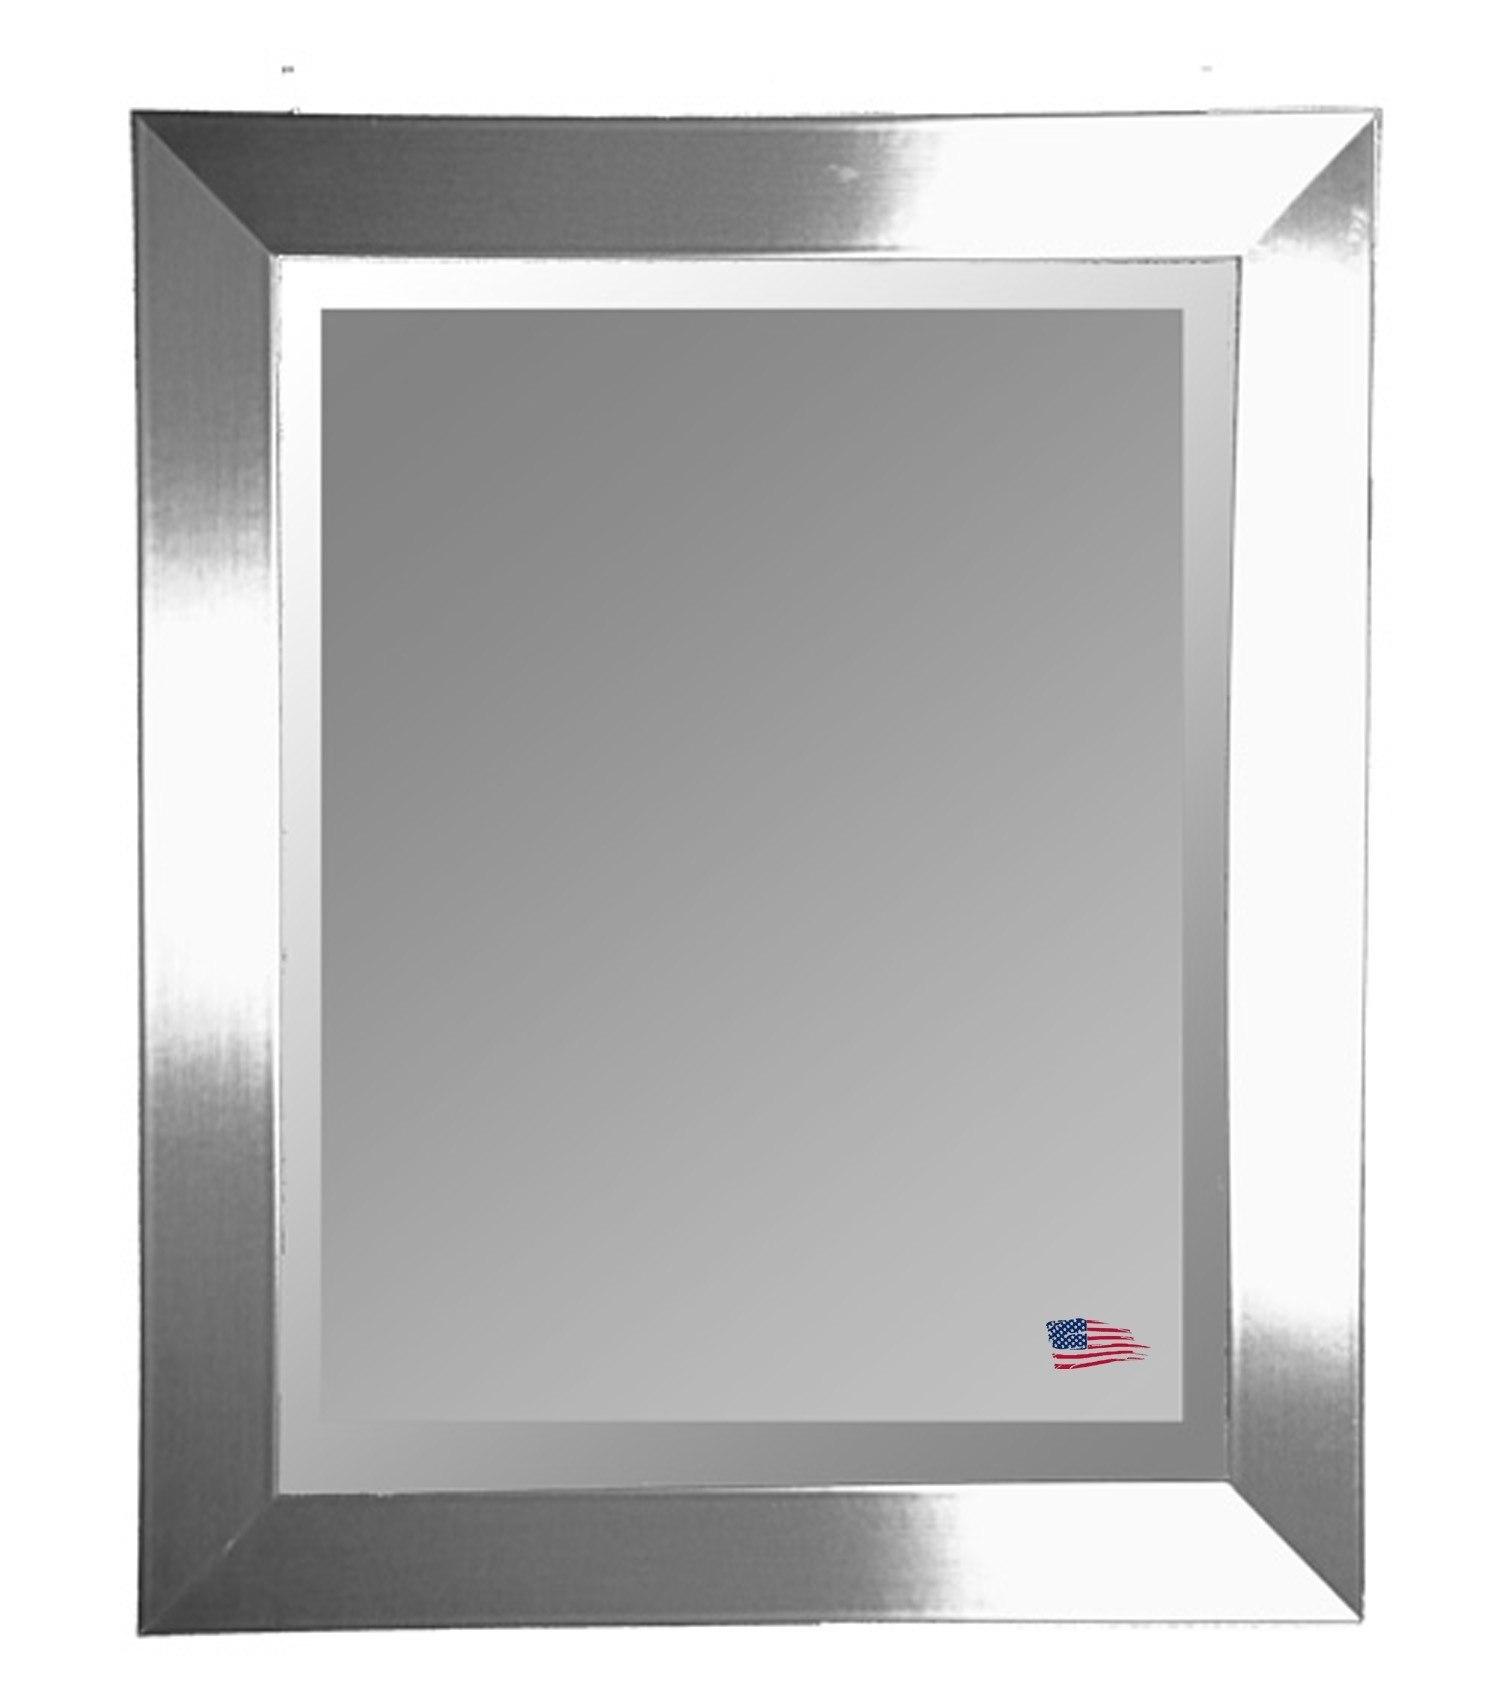 Rayne Mirrors R003L 39.5 x 45.5 Inch Silver Wide Wall Mirror